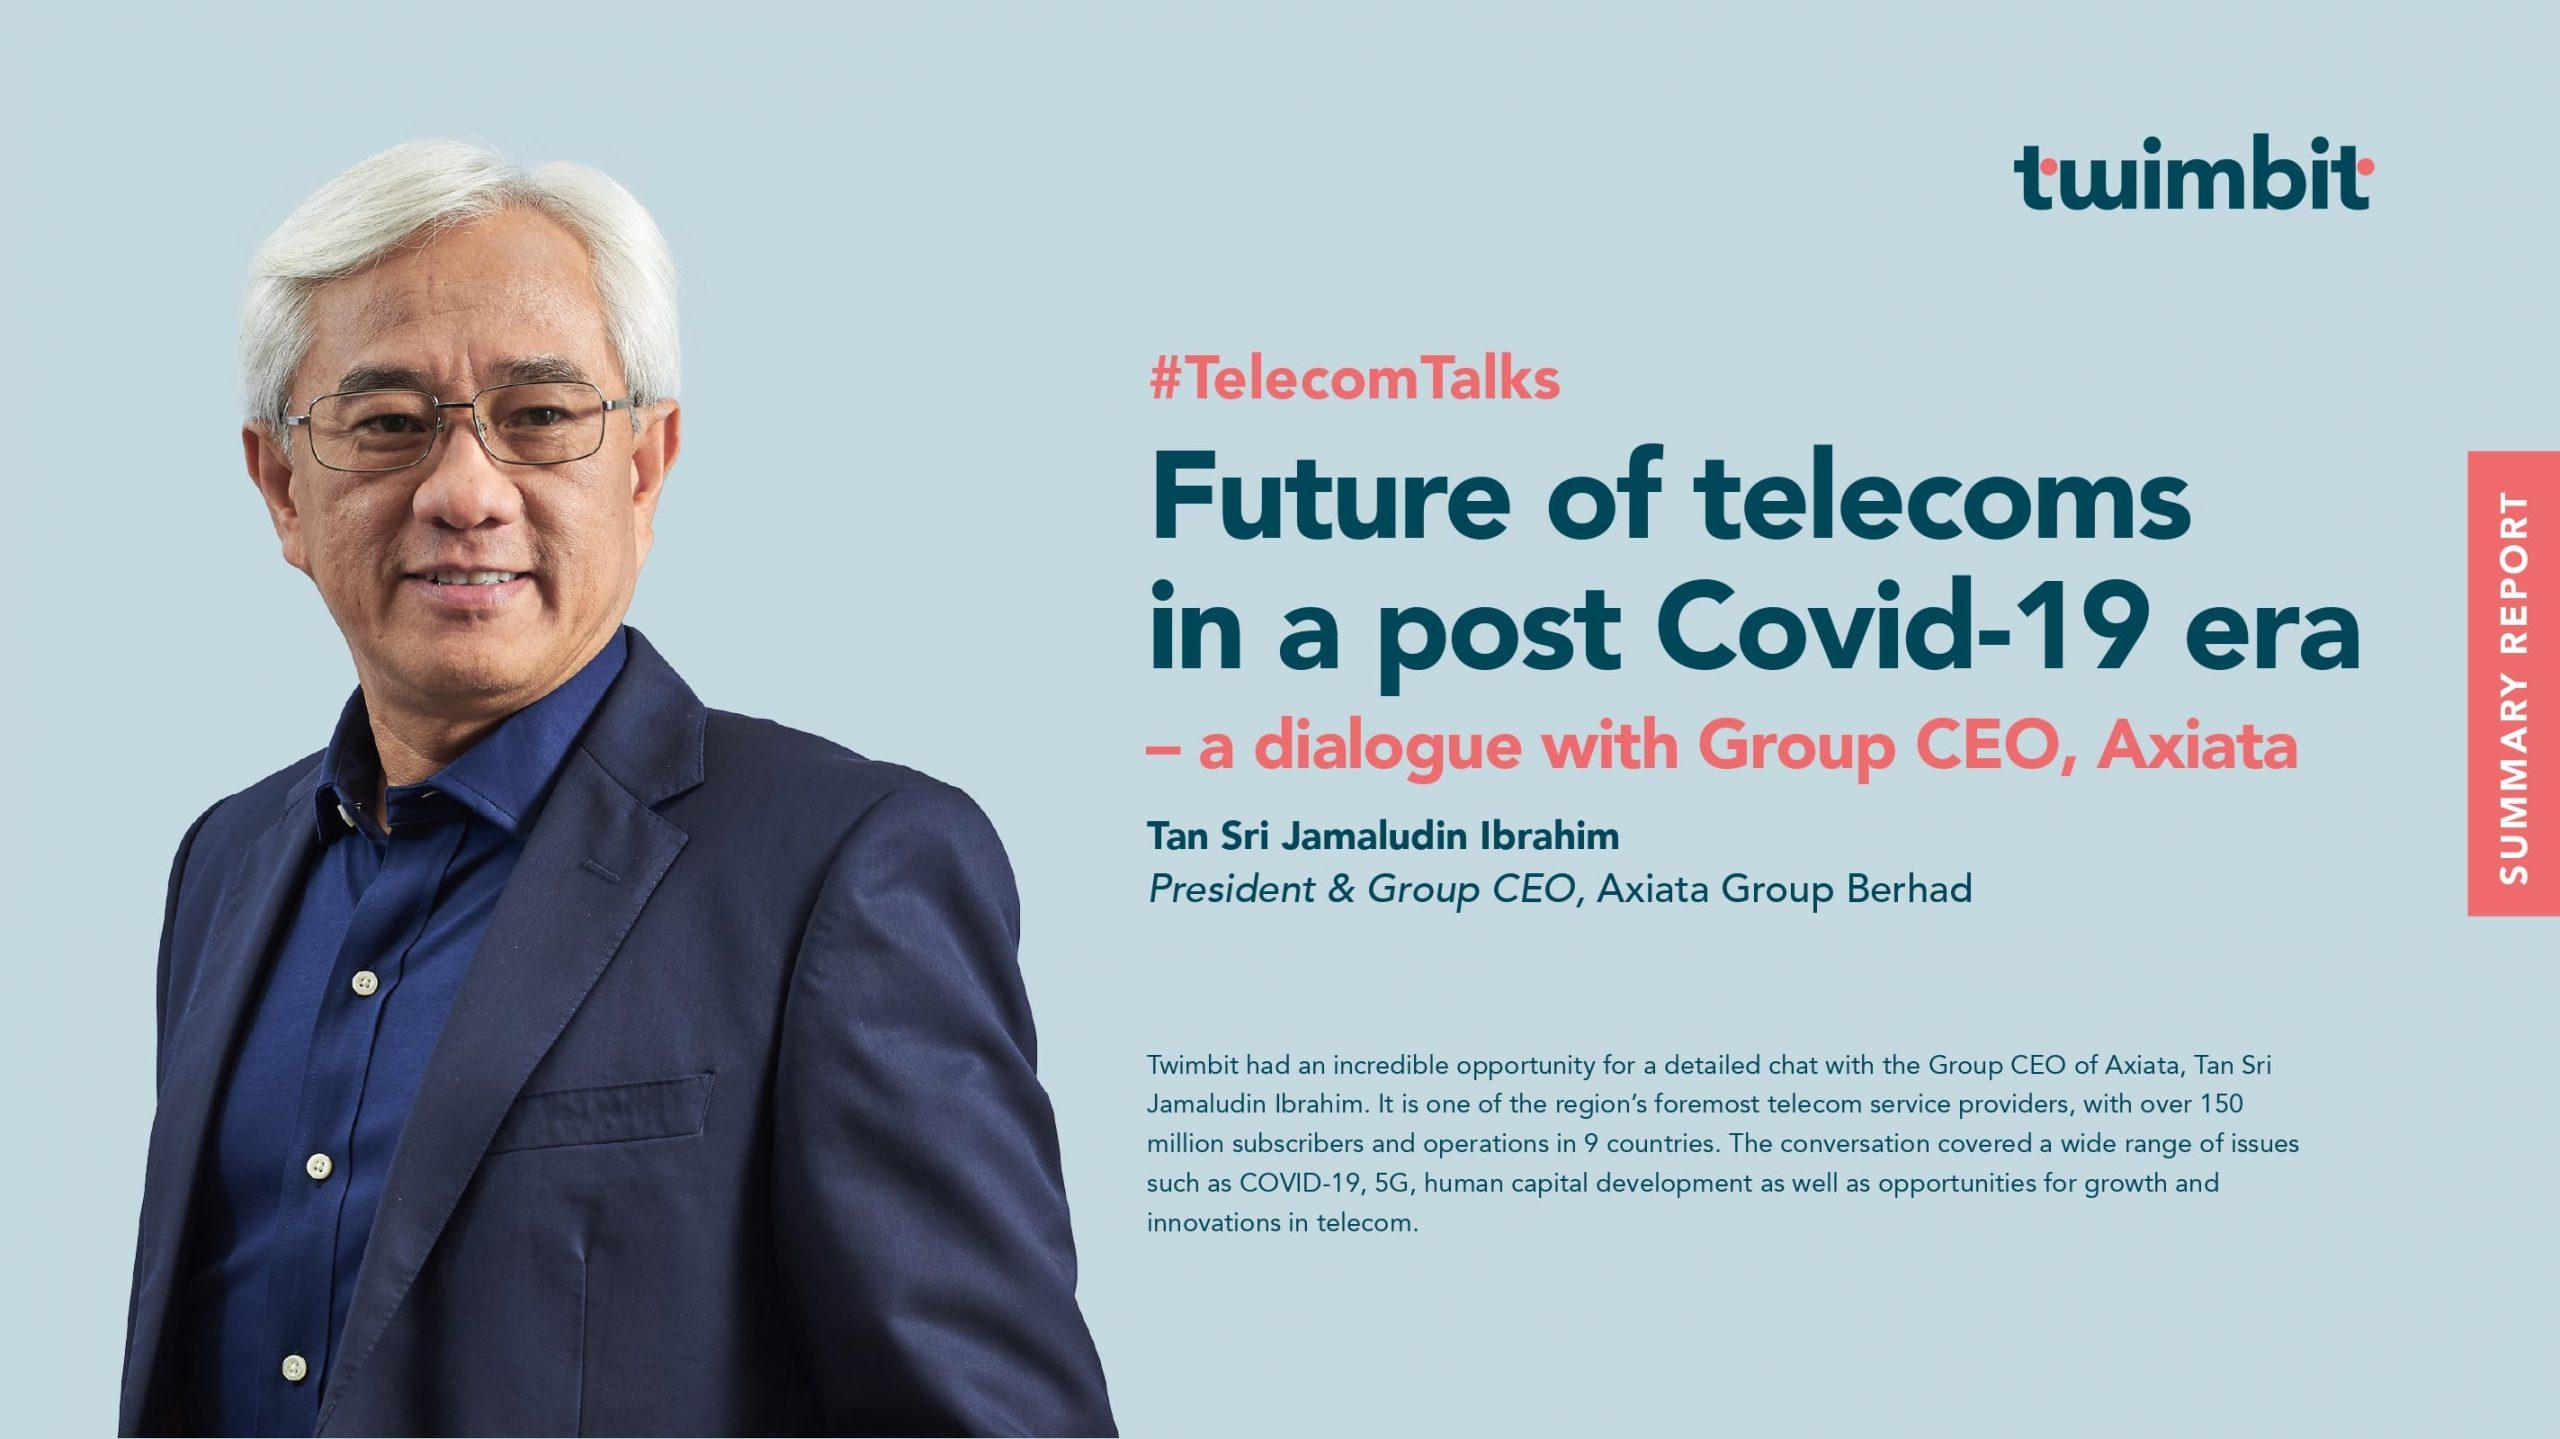 impact of covid on telecoms, axiata, 5g, asia, career